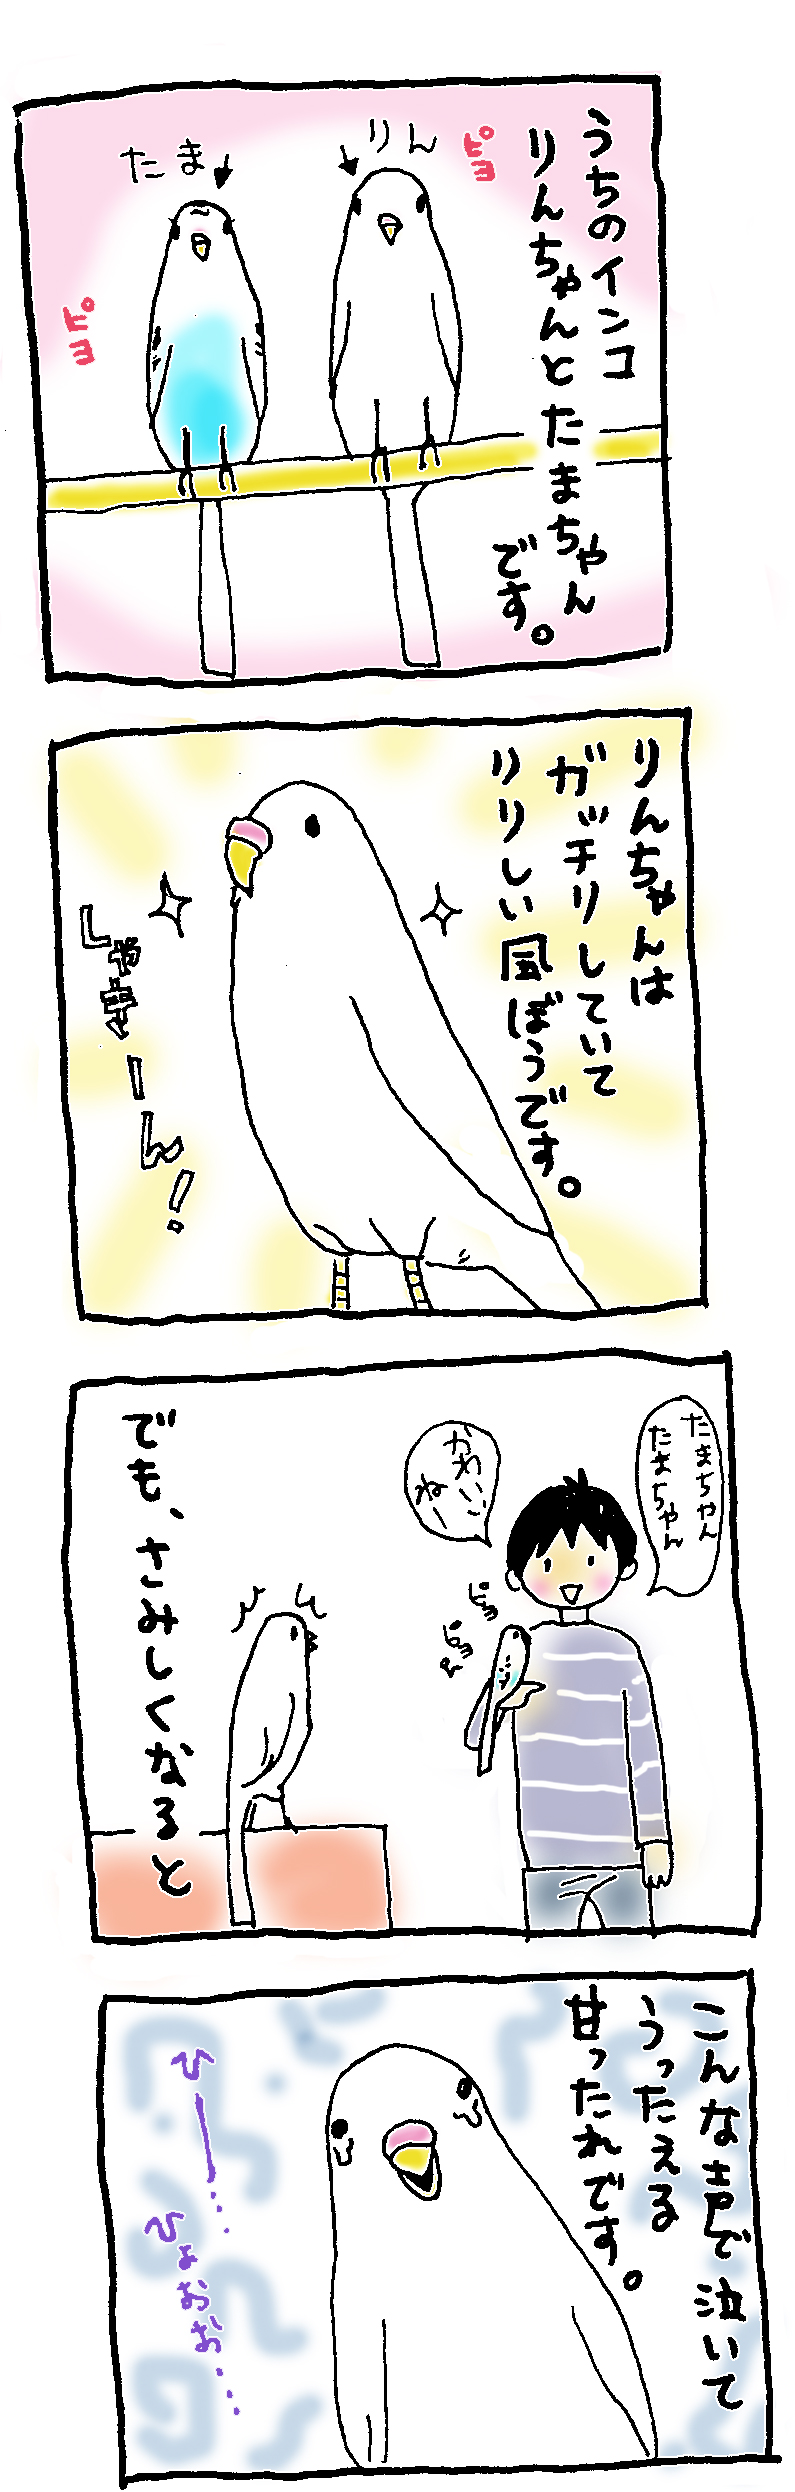 http://f.st-hatena.com/images/fotolife/h/hiro-okawari/20150512/20150512150608_original.jpg?1431410782